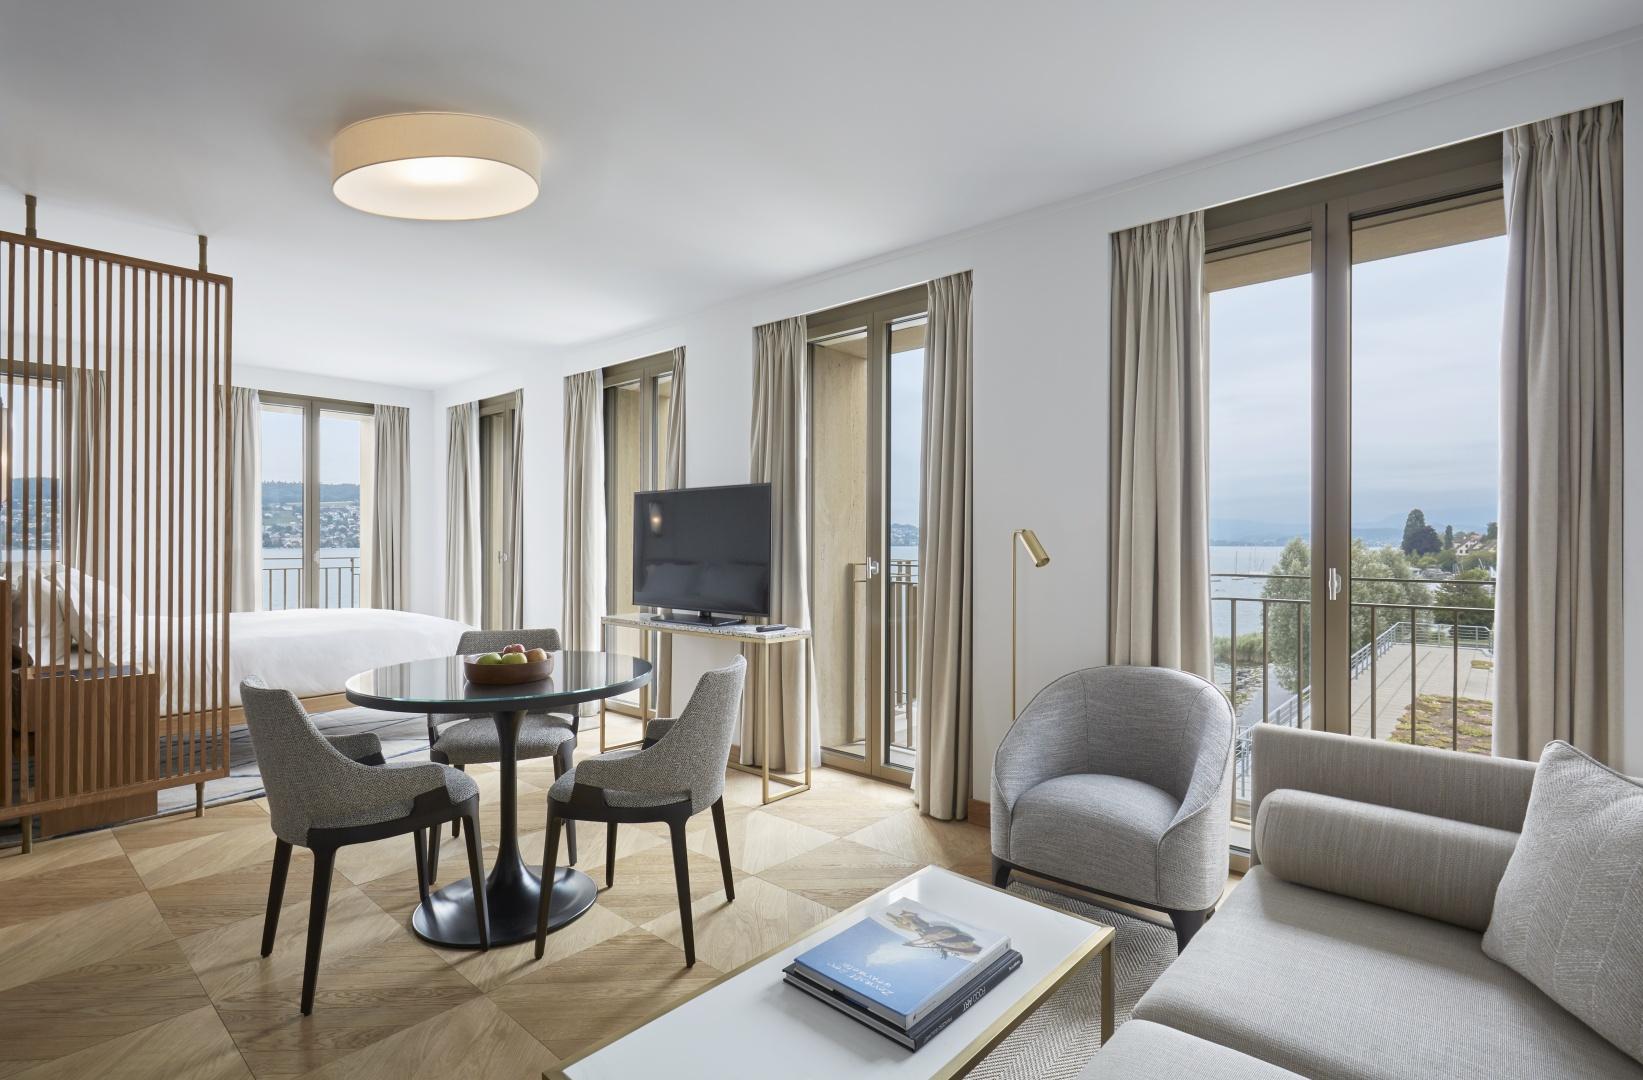 Hotelzimmer © James McDonald Photgraphy, London